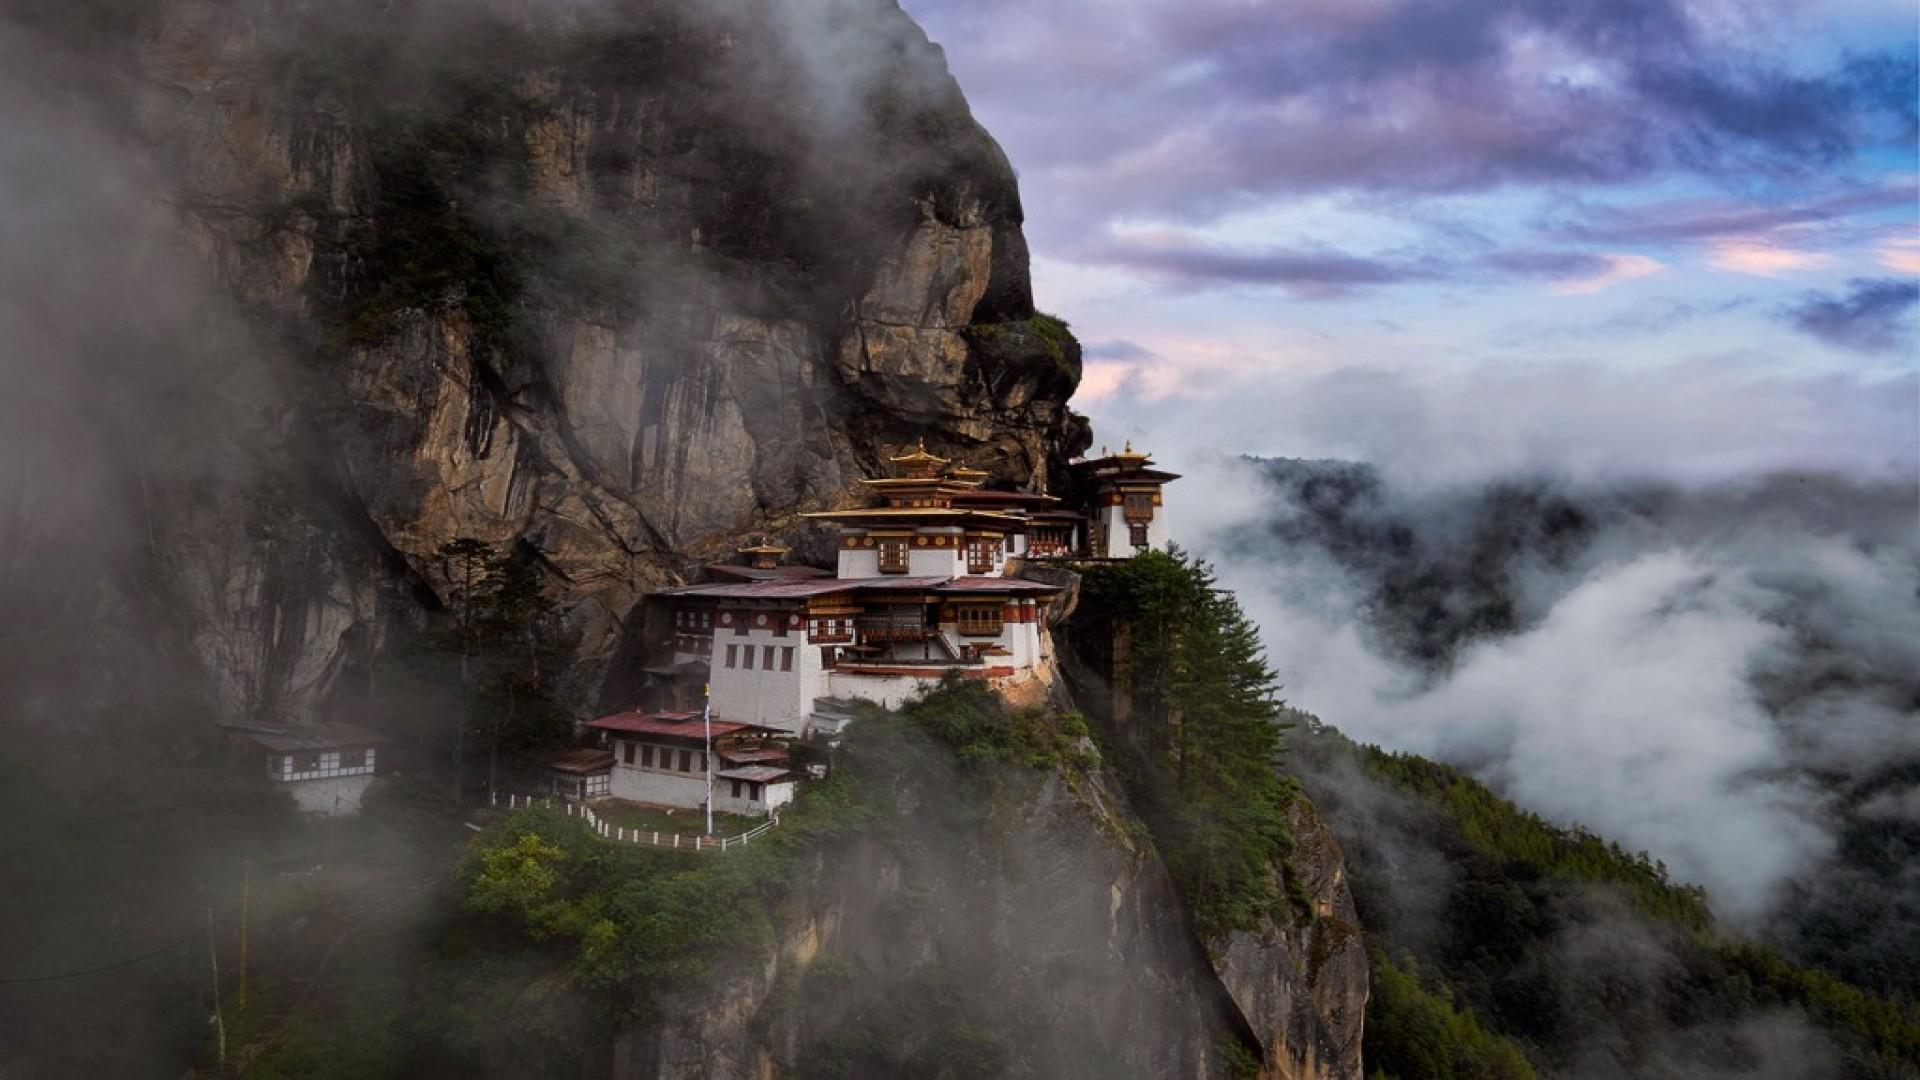 BHUTAN - LEGEND OF THUNDER DRAGON